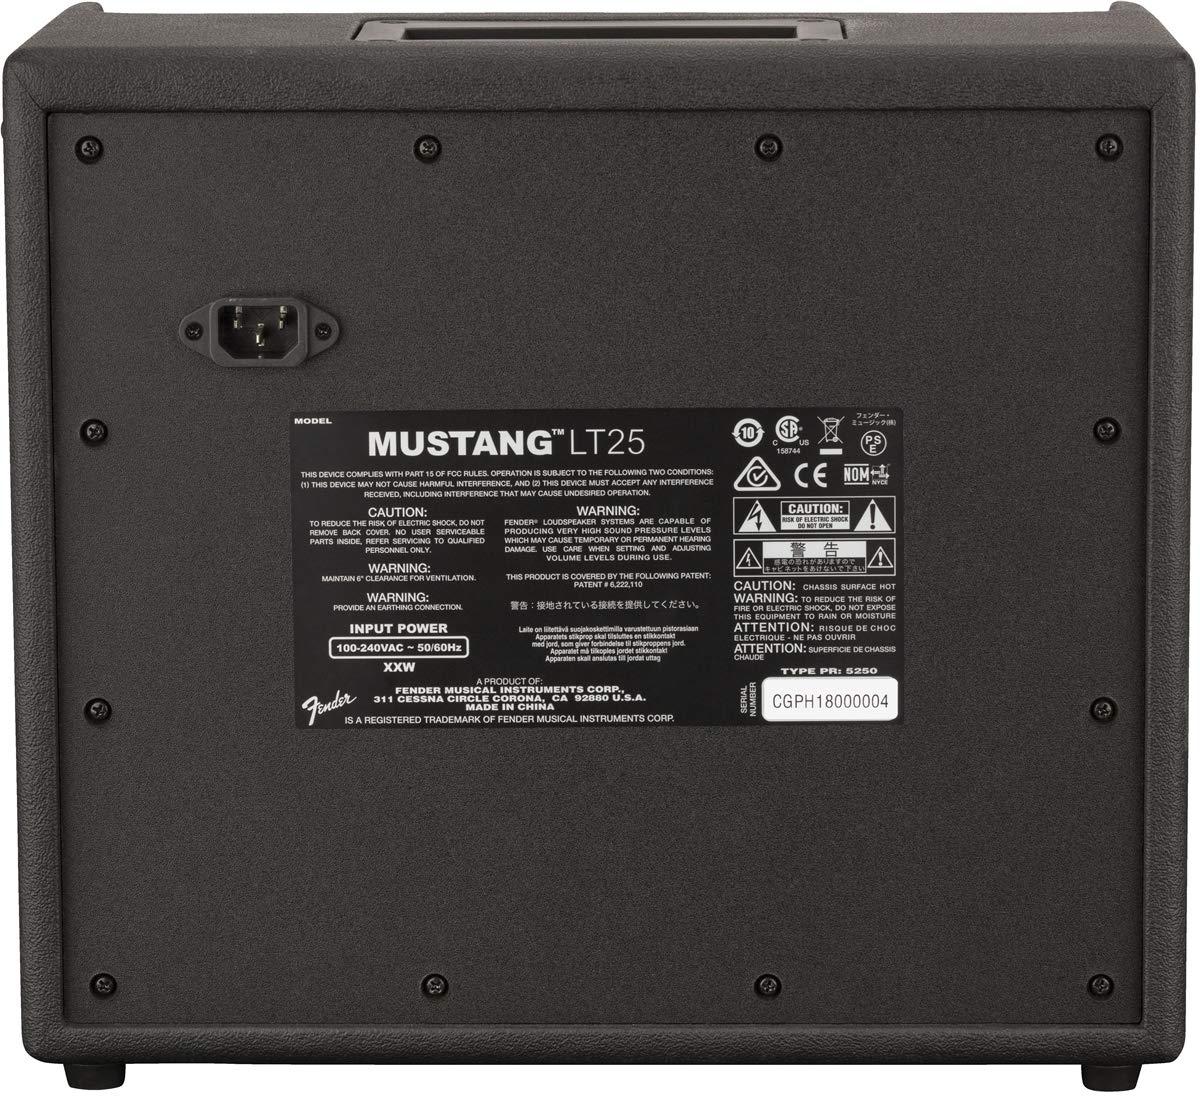 Fender Mustang LT-25 - Digital Guitar Amplifier by Fender (Image #2)